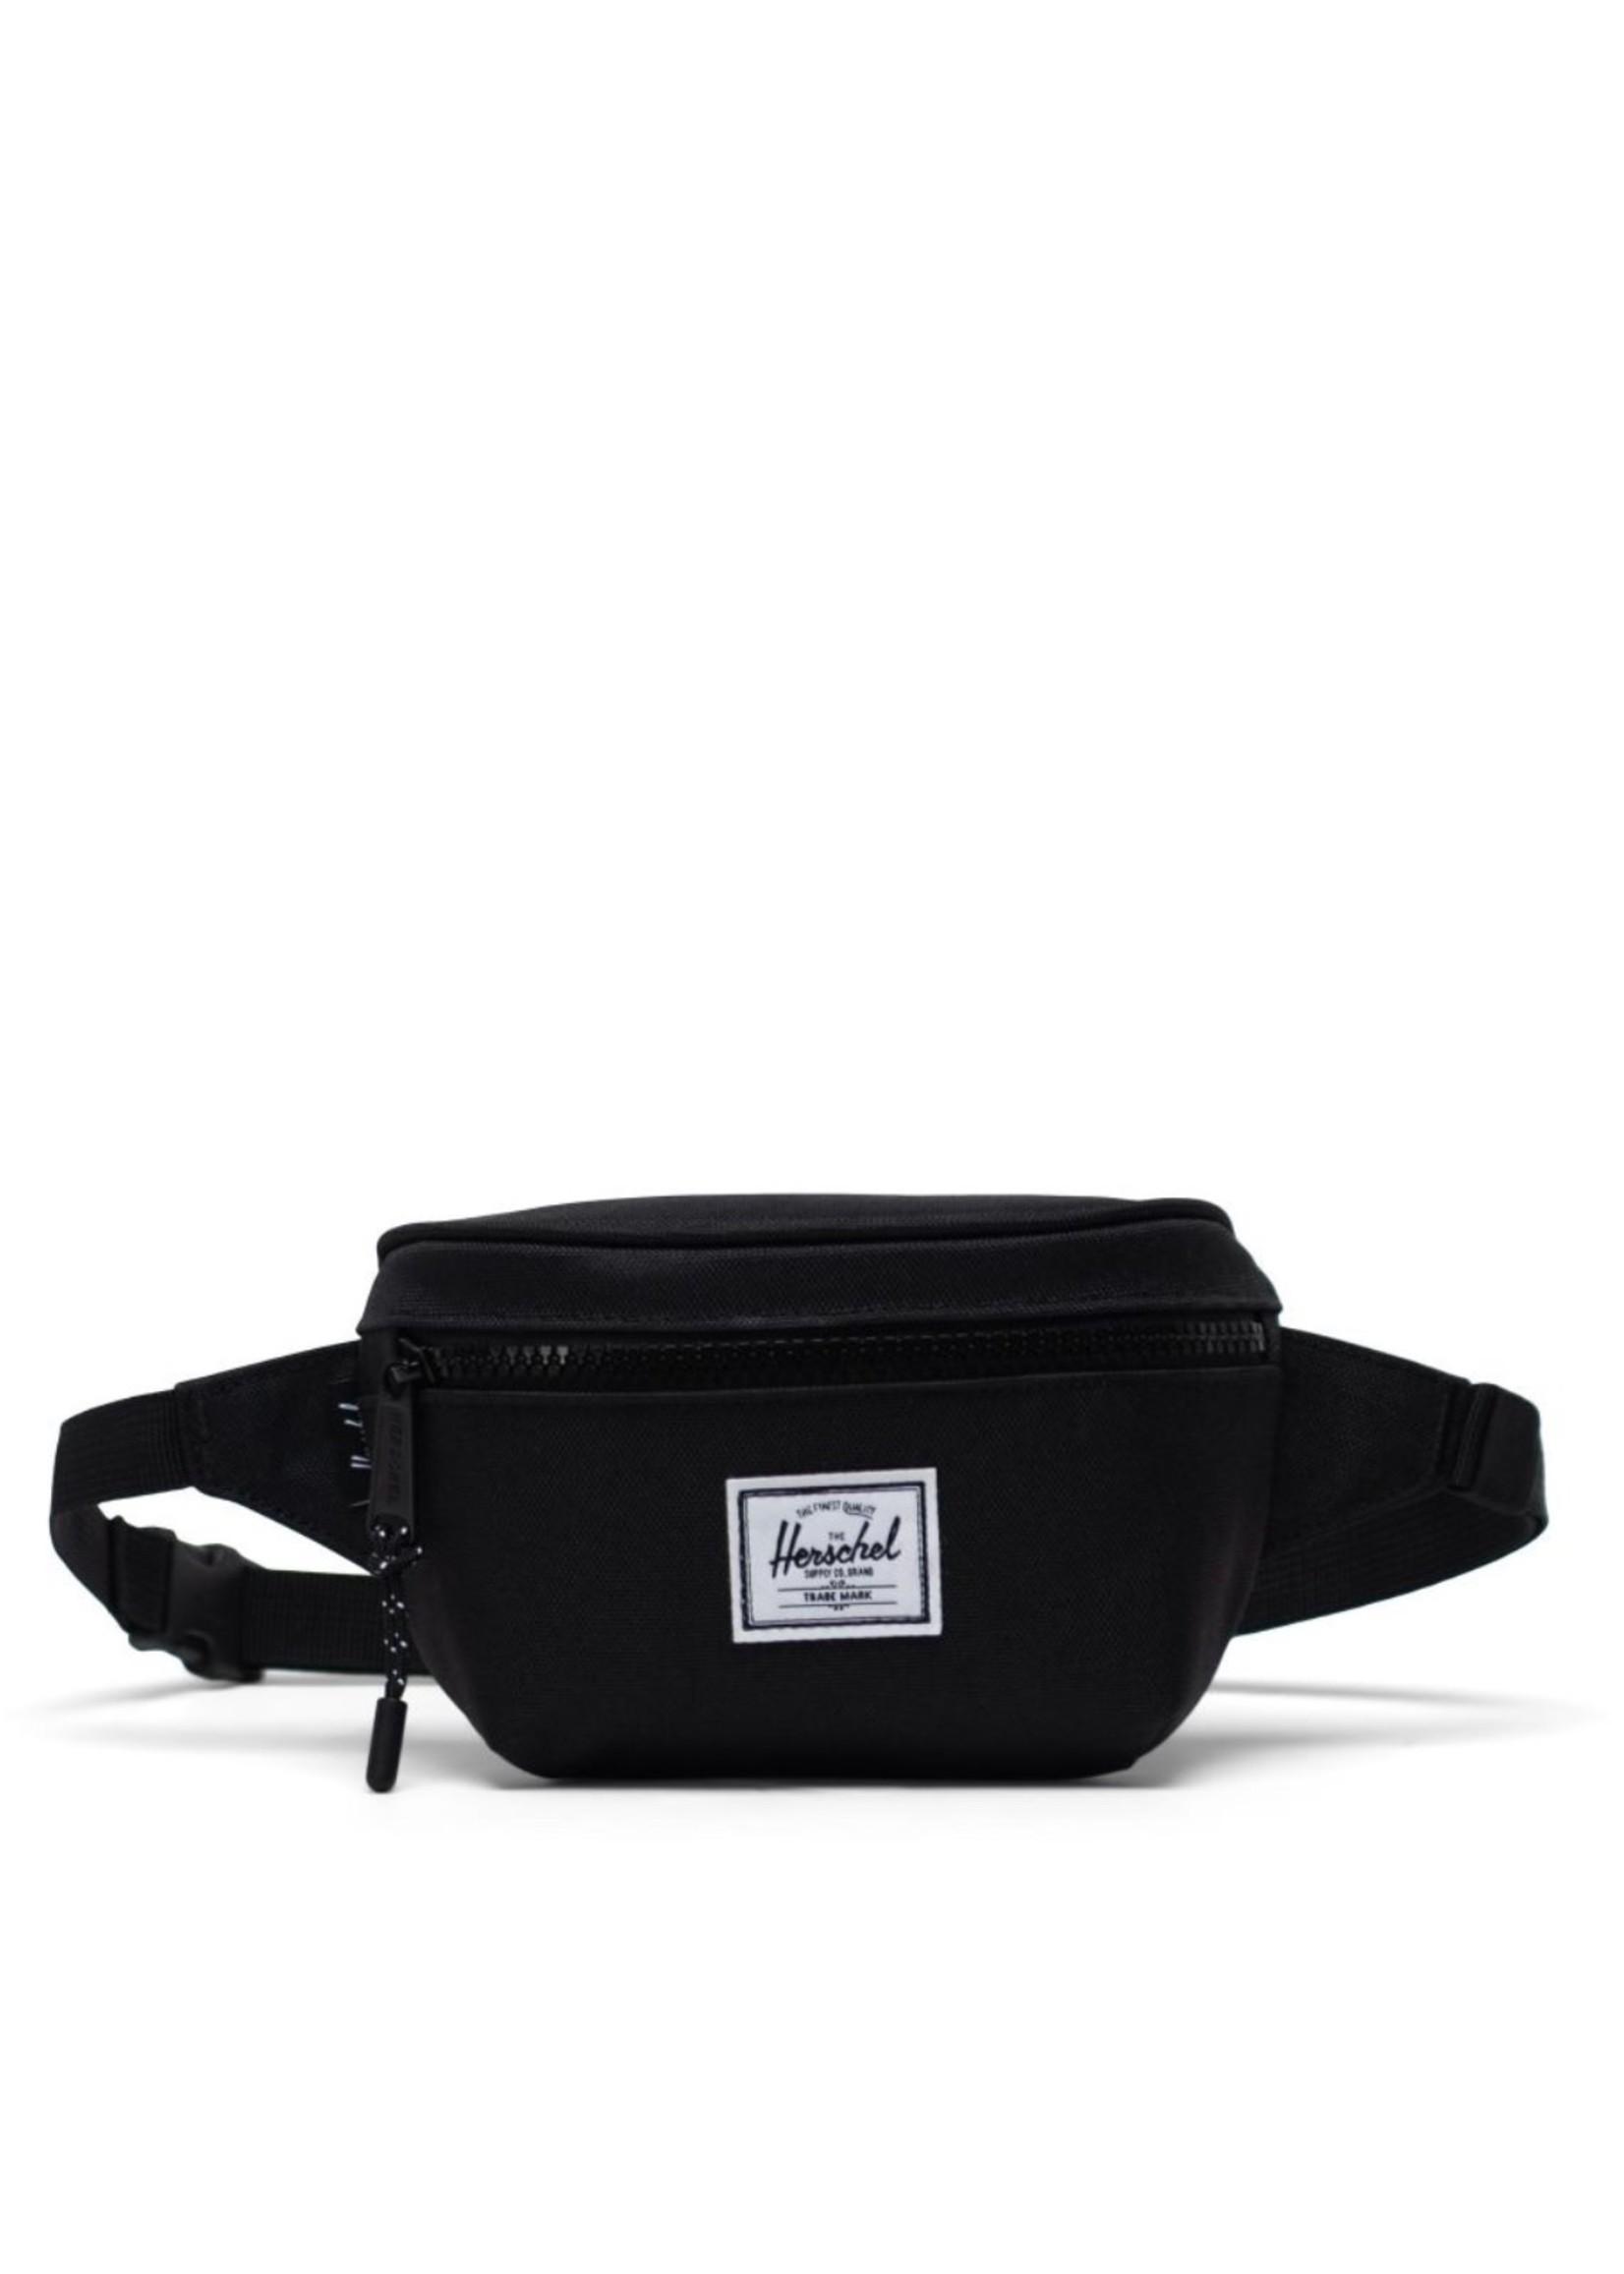 Herschel Supply Co. Twelve Hip Pack   Kids, Black, 1L